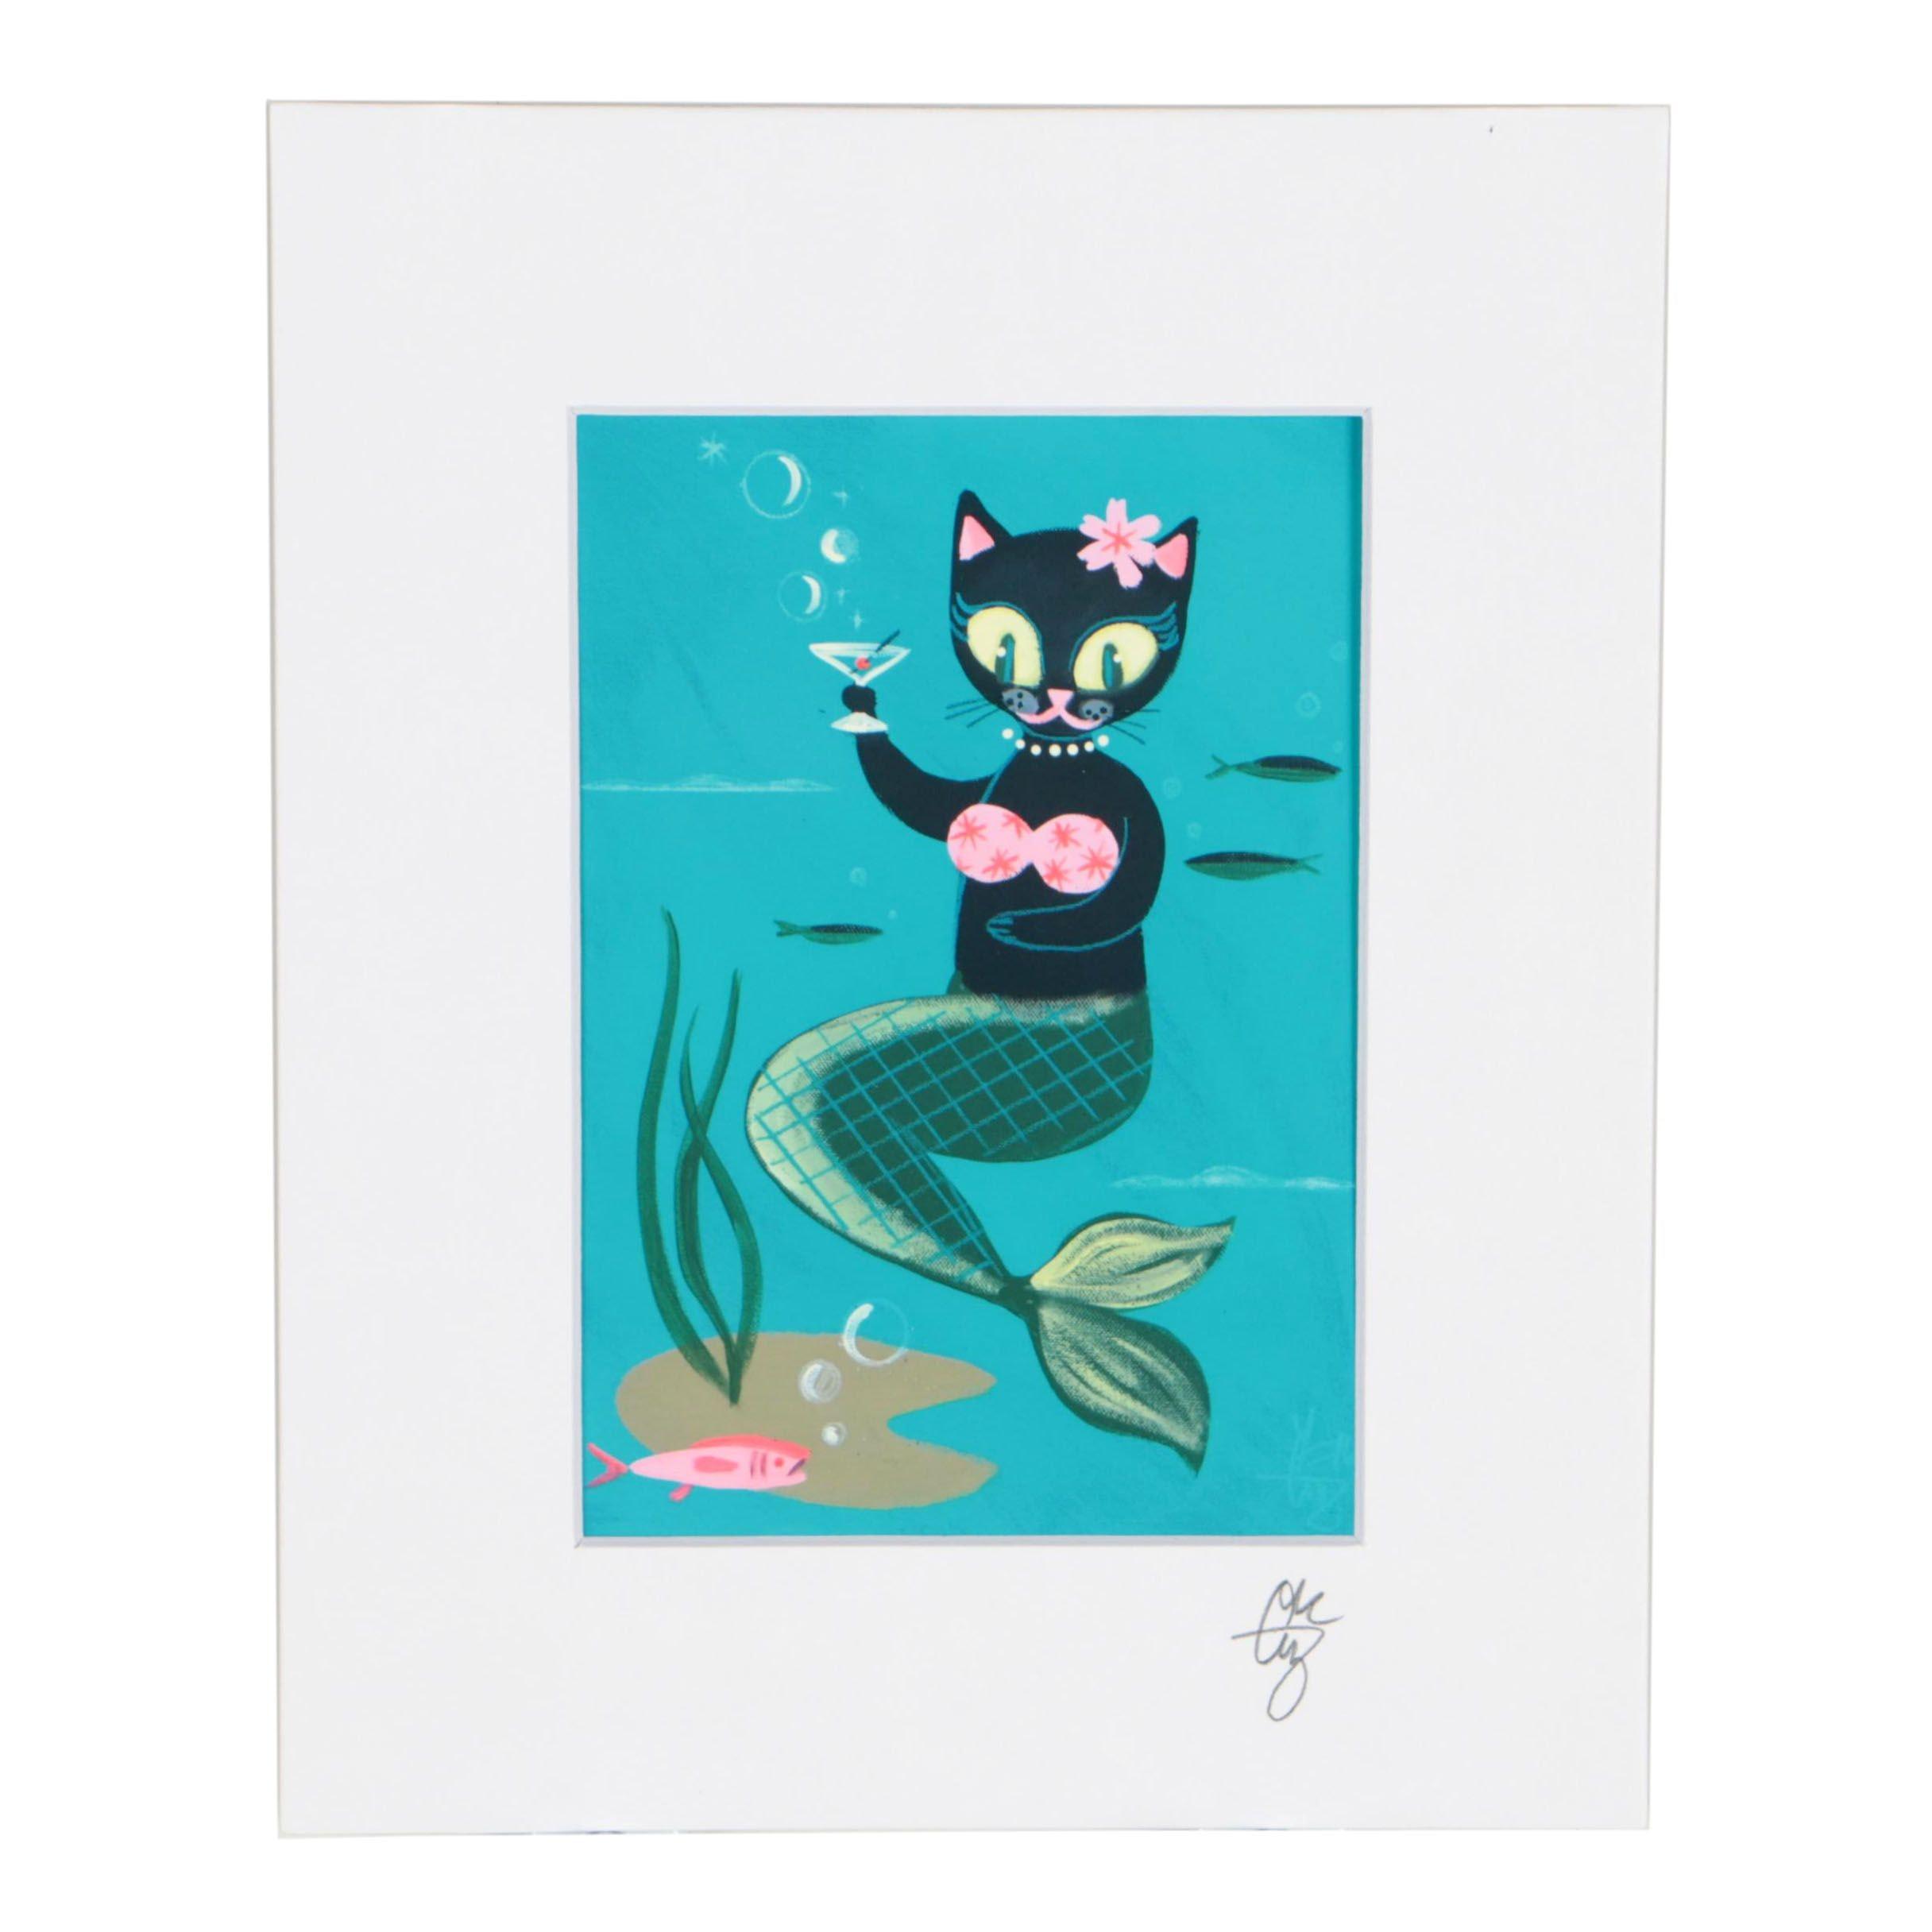 El Gato Gomez Signed Giclée Cat Mermaid with Martini